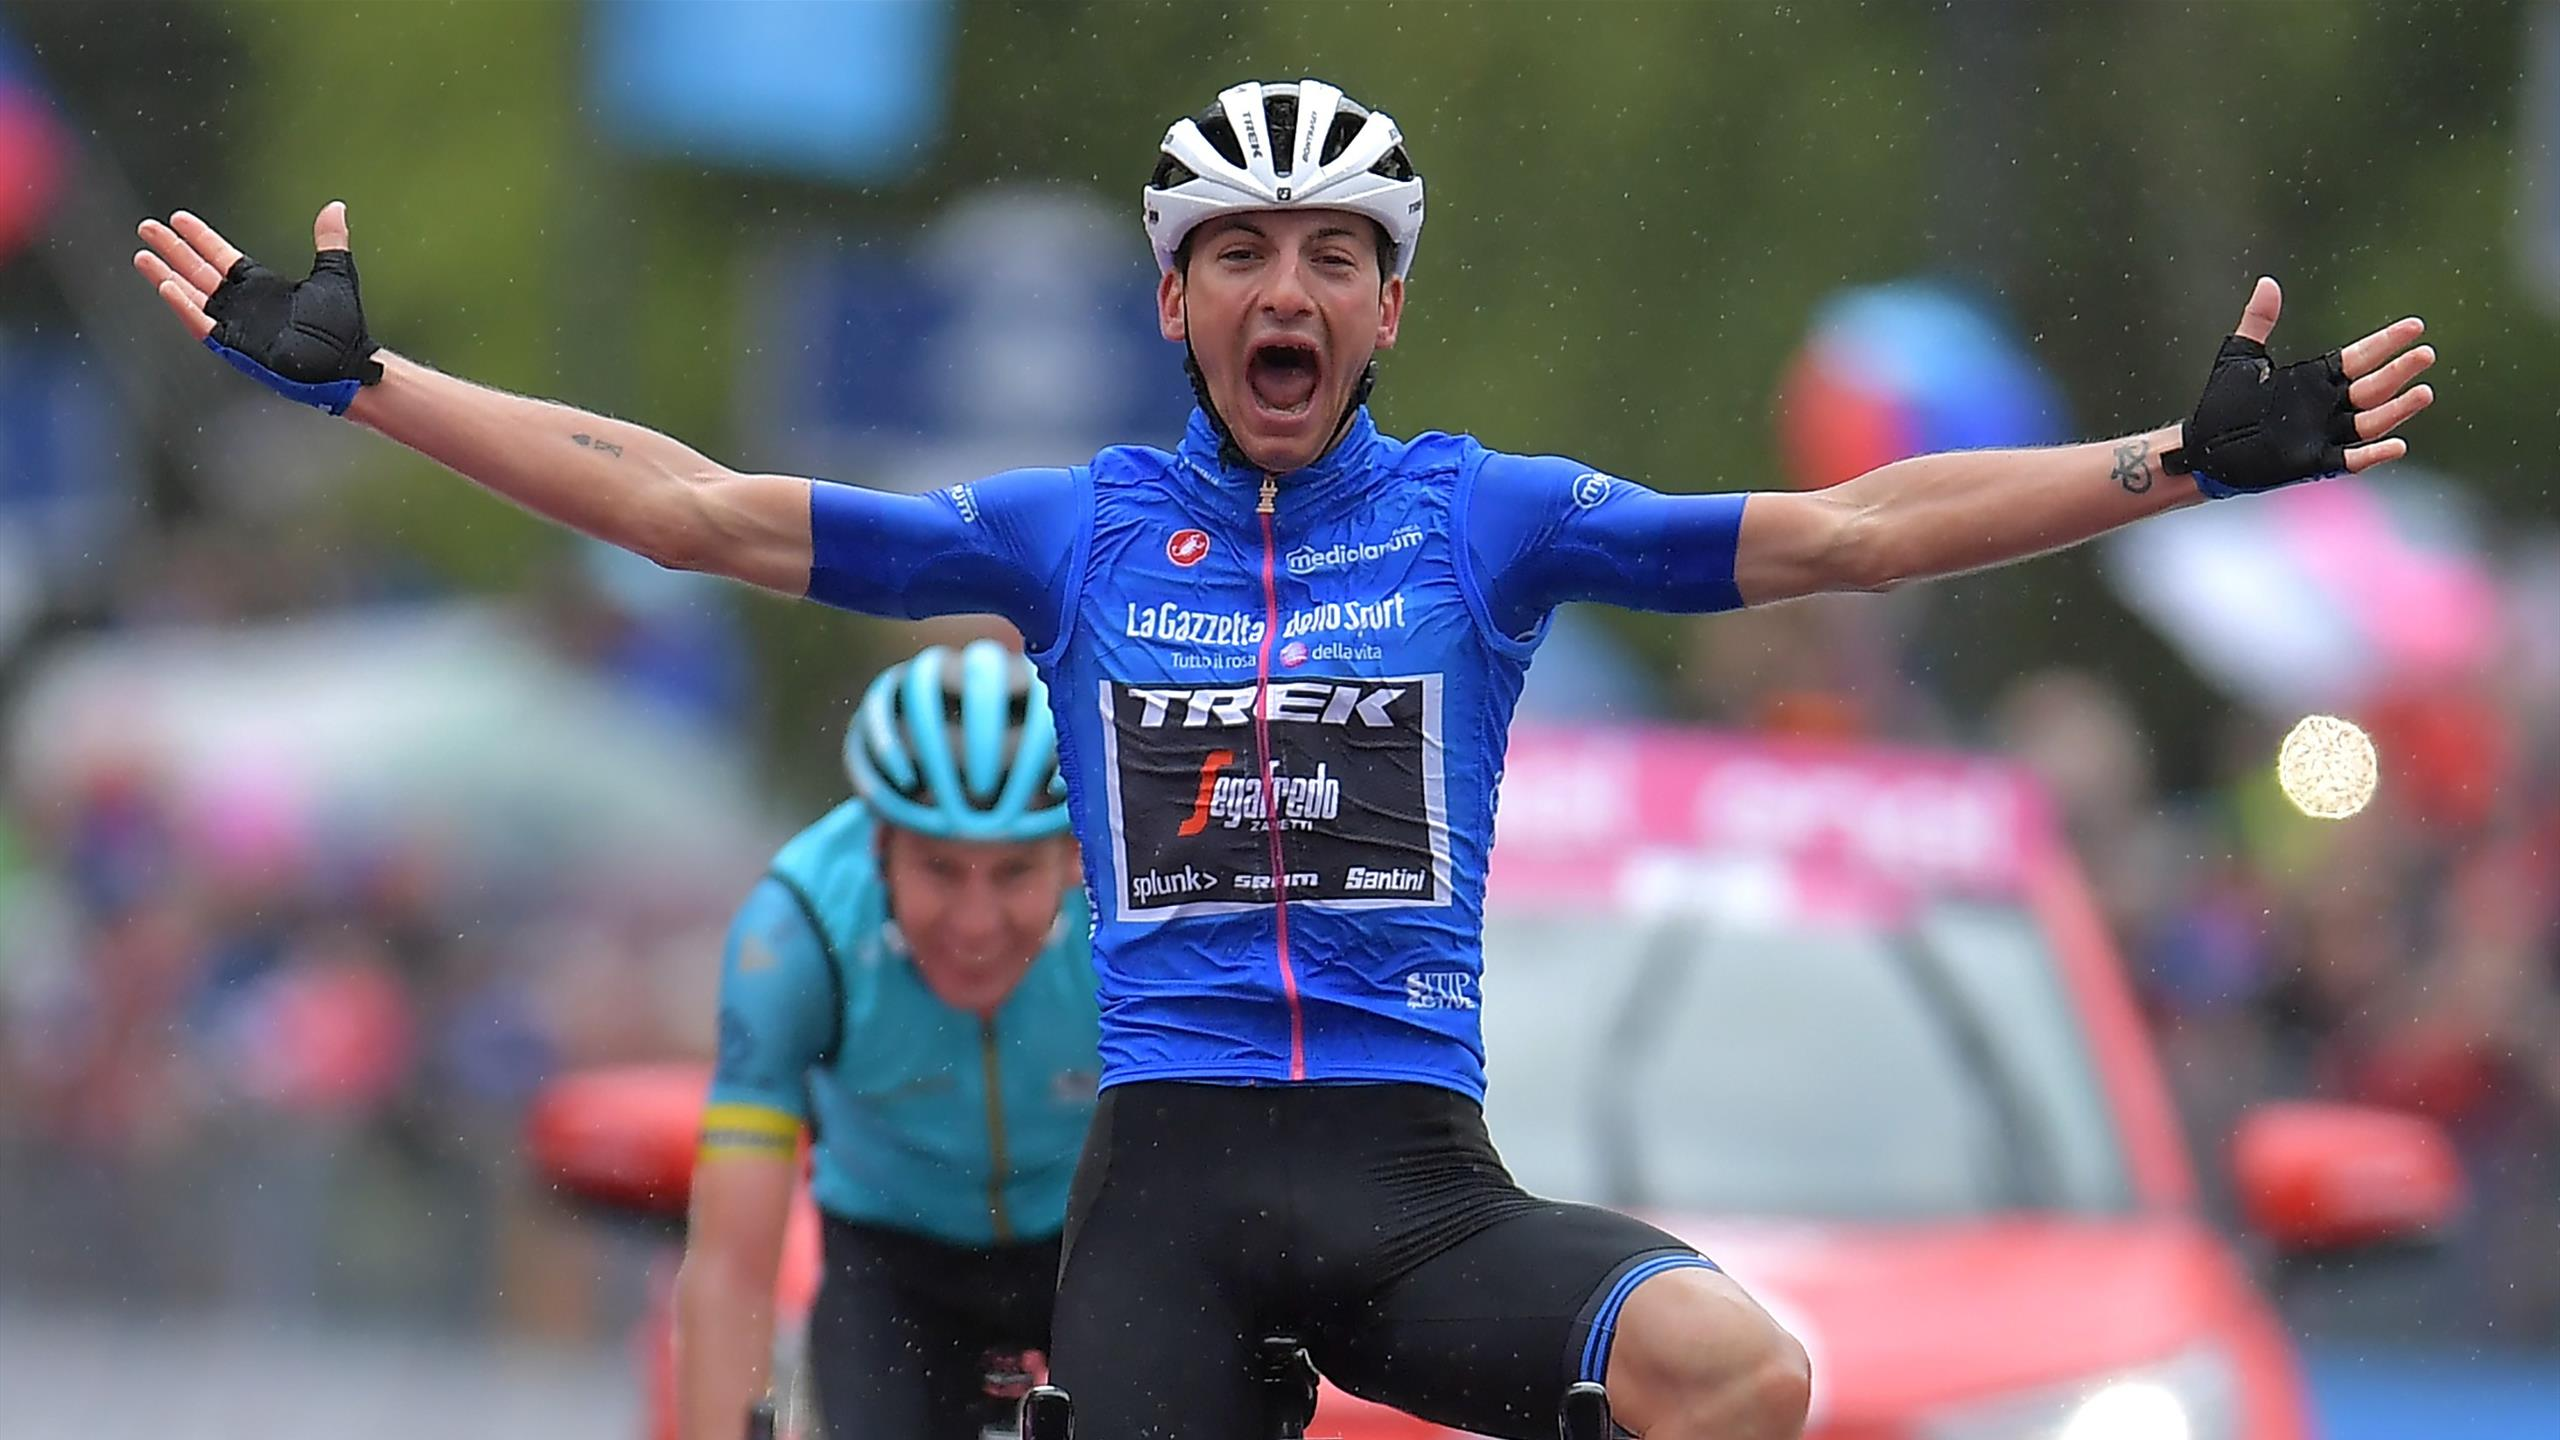 Giro DItalia Sieger